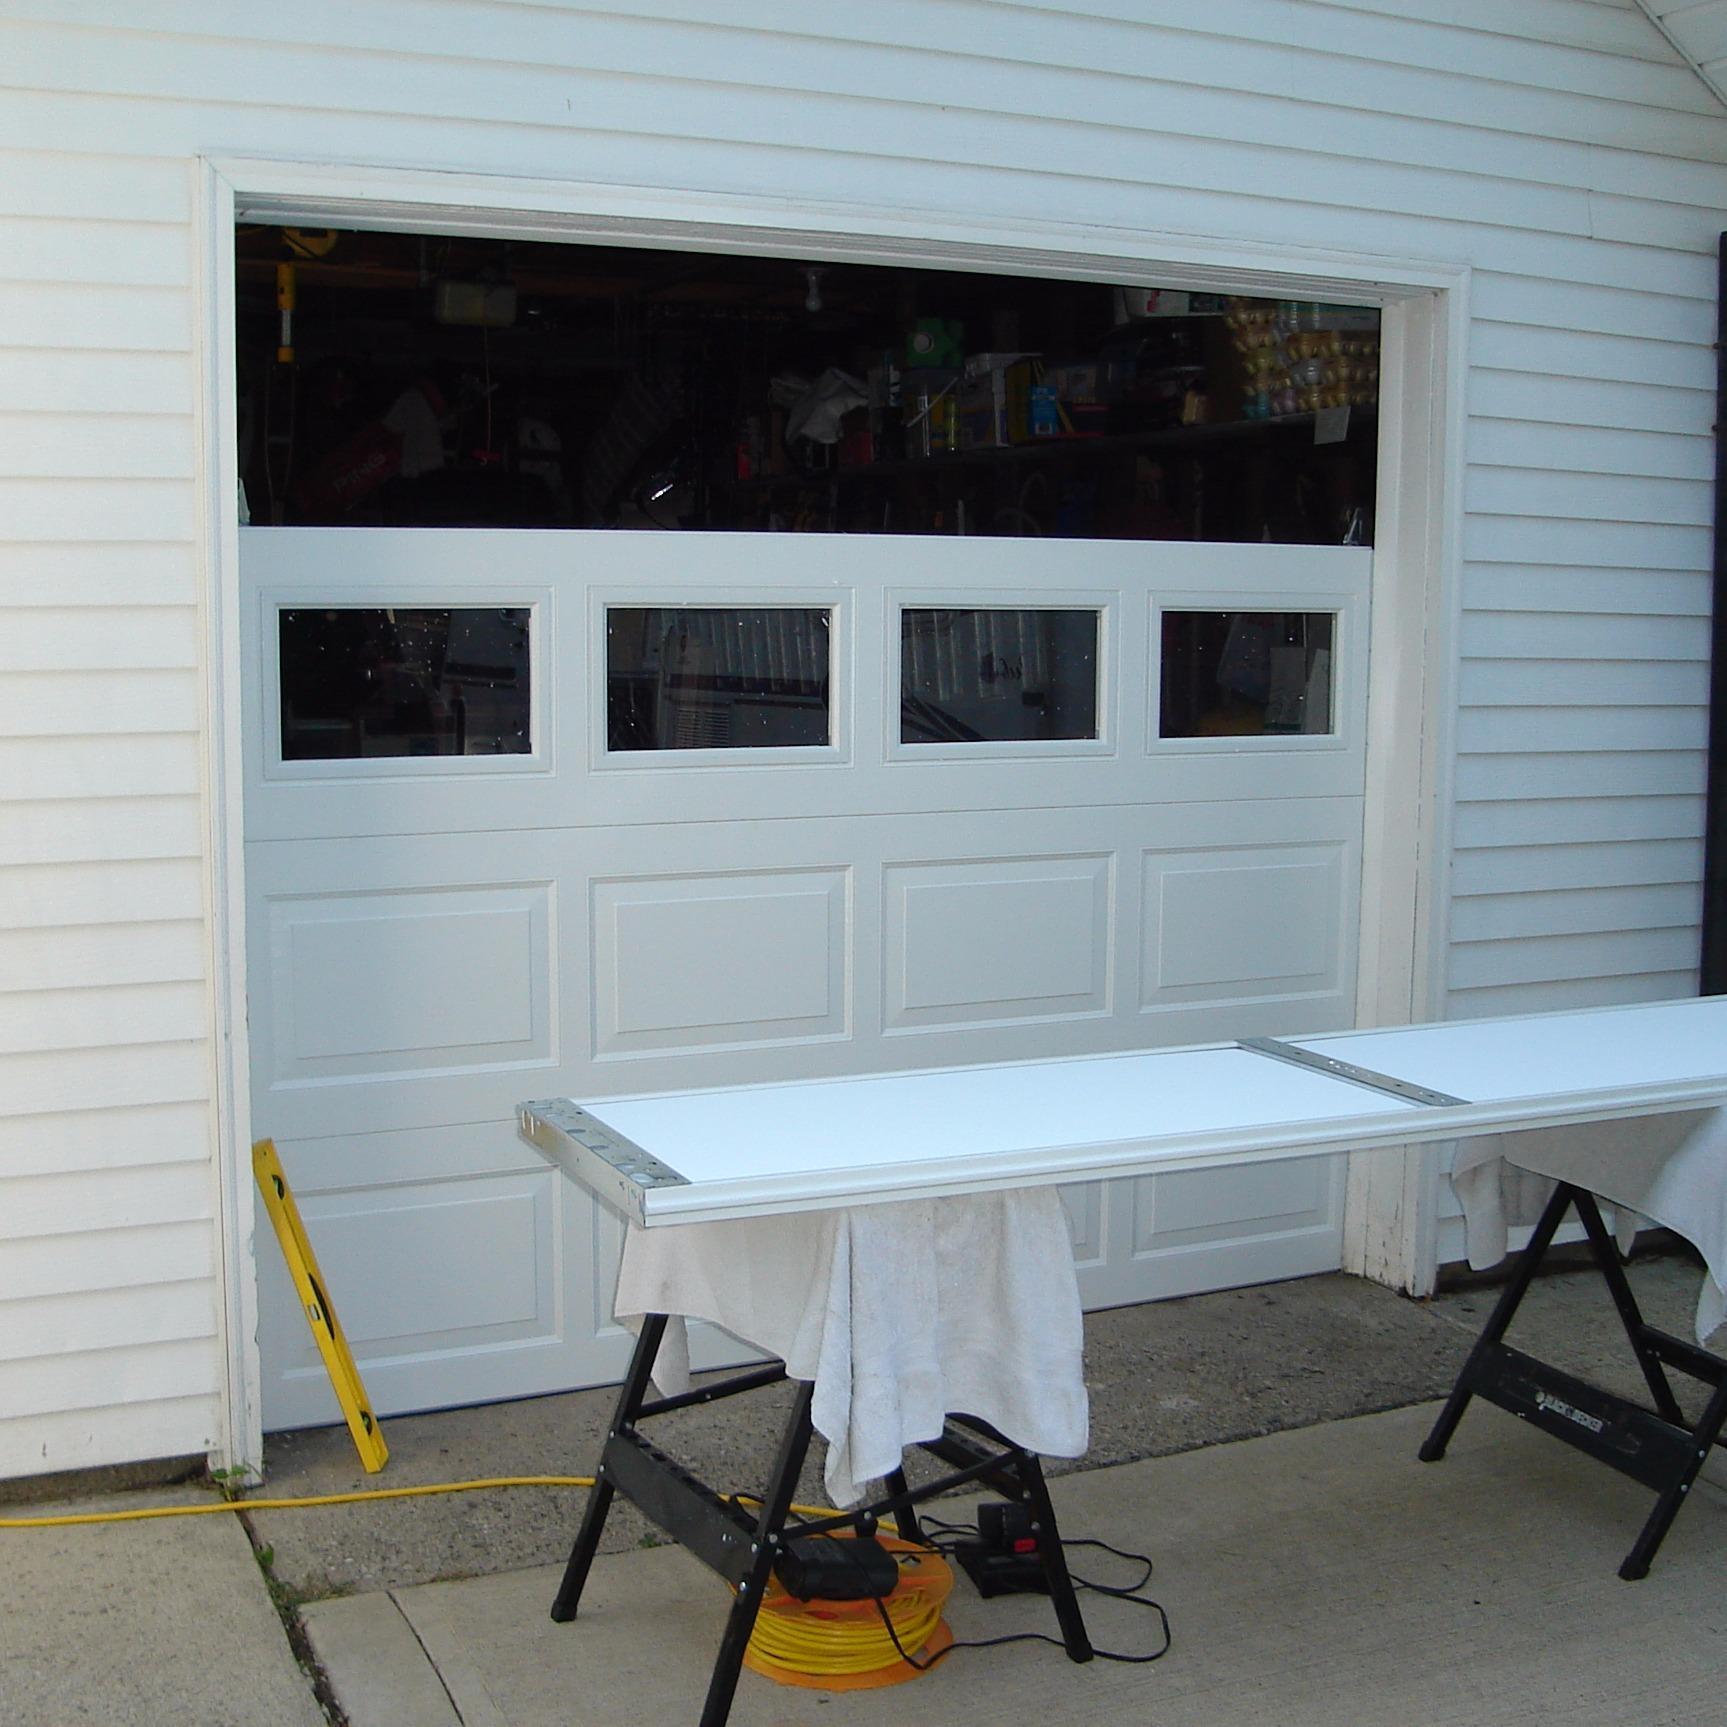 Speedy garage door repair in lake forest ca garages for Garage door repair lake forest